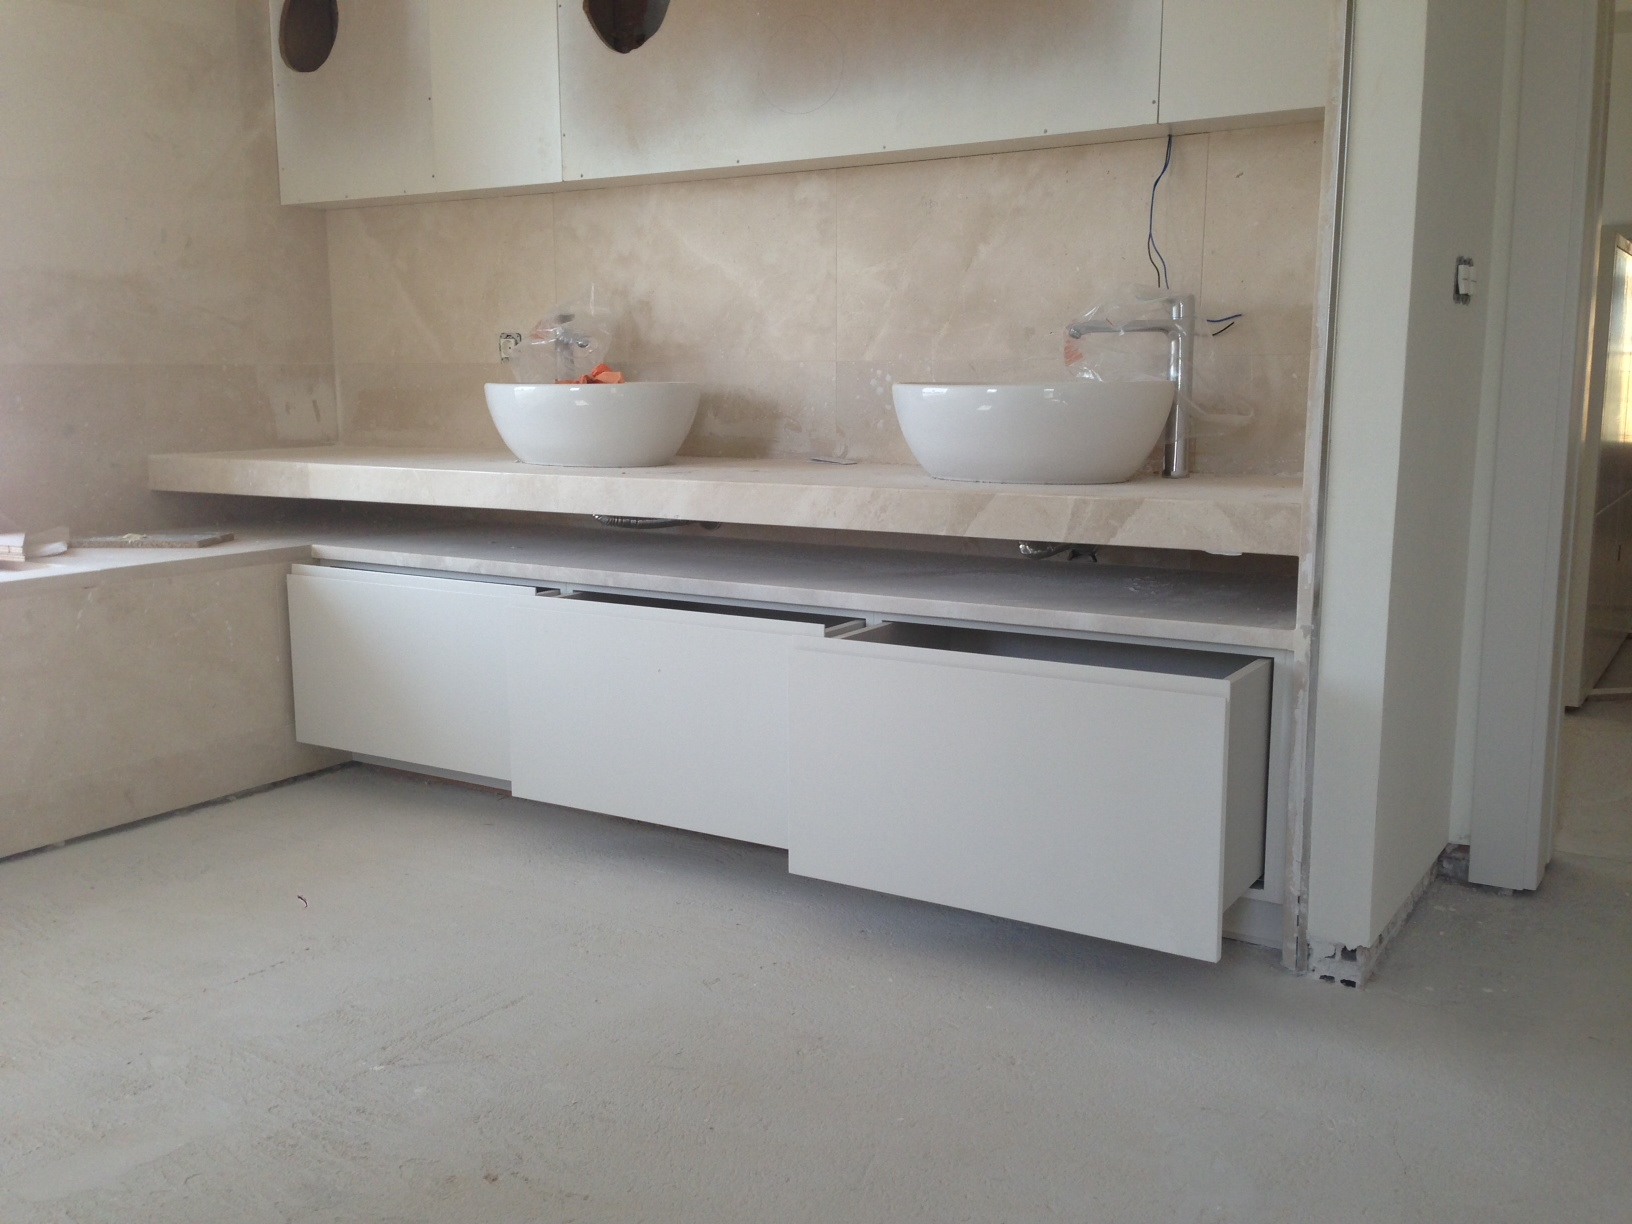 Muebles bano diseno 20170906212531 for Mobiliario de bano de diseno